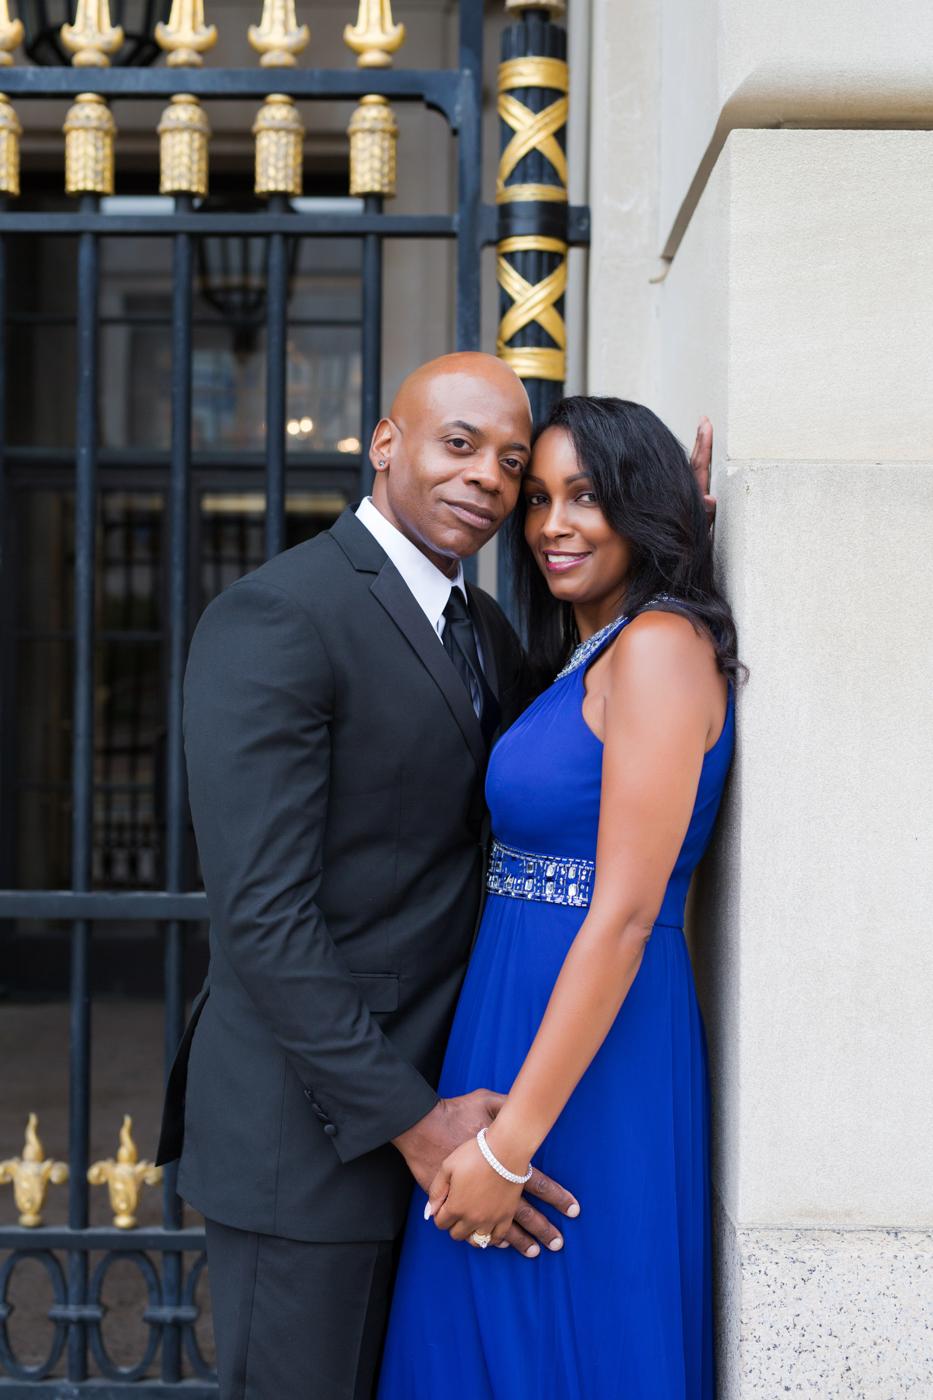 wedding-anniversary-photo-shoot-in-washington-dc-ksenia-pro-photography-2